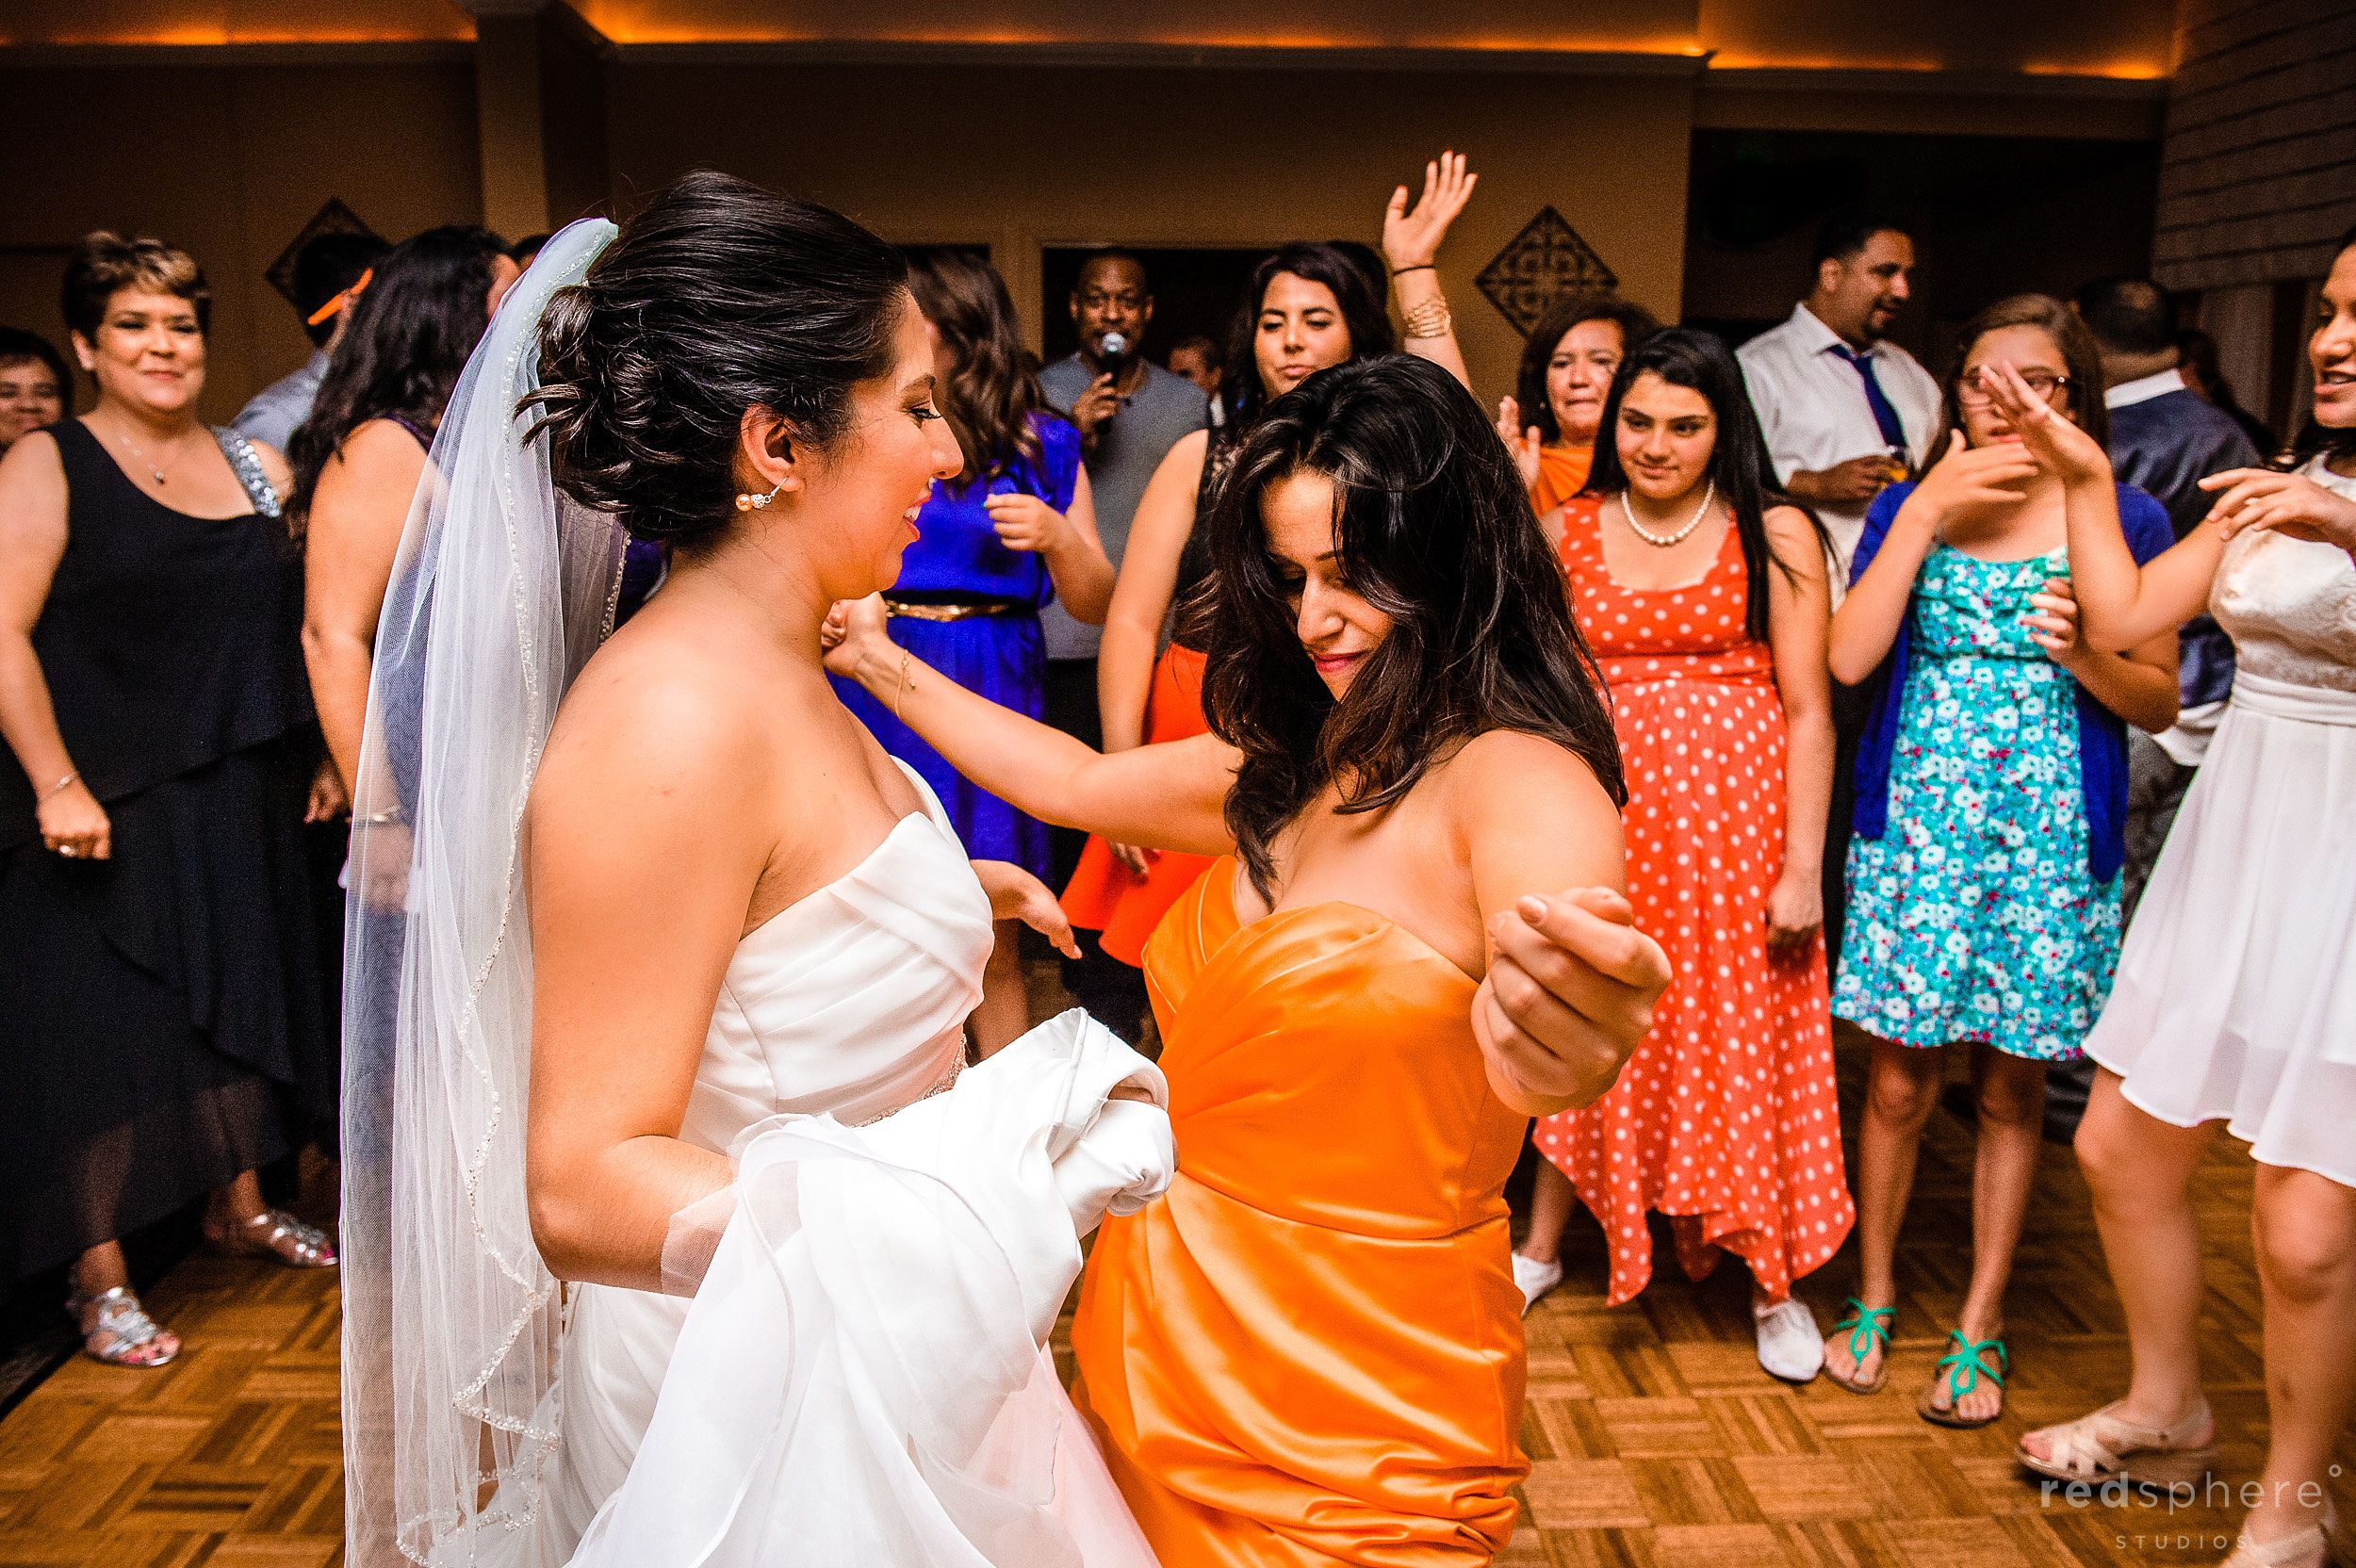 Bridesmaid and Bride Dancing on Dance Floor